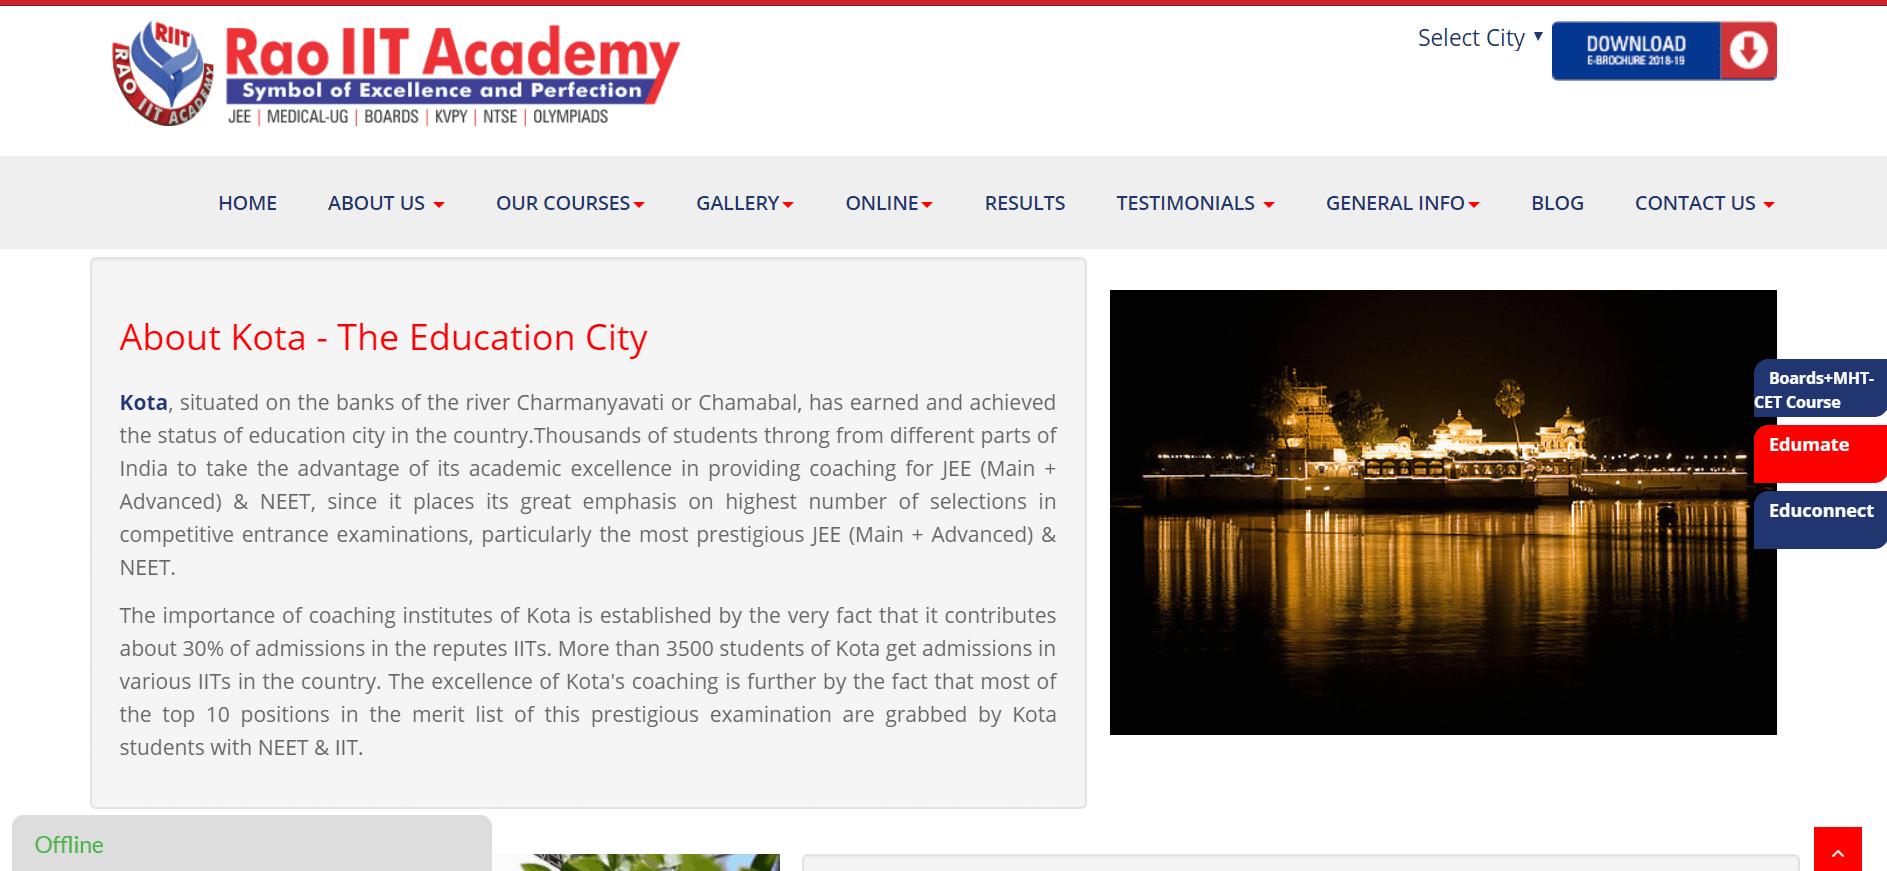 IIT-JEE Coaching Institutes in Kota [Rao IIT Academy]